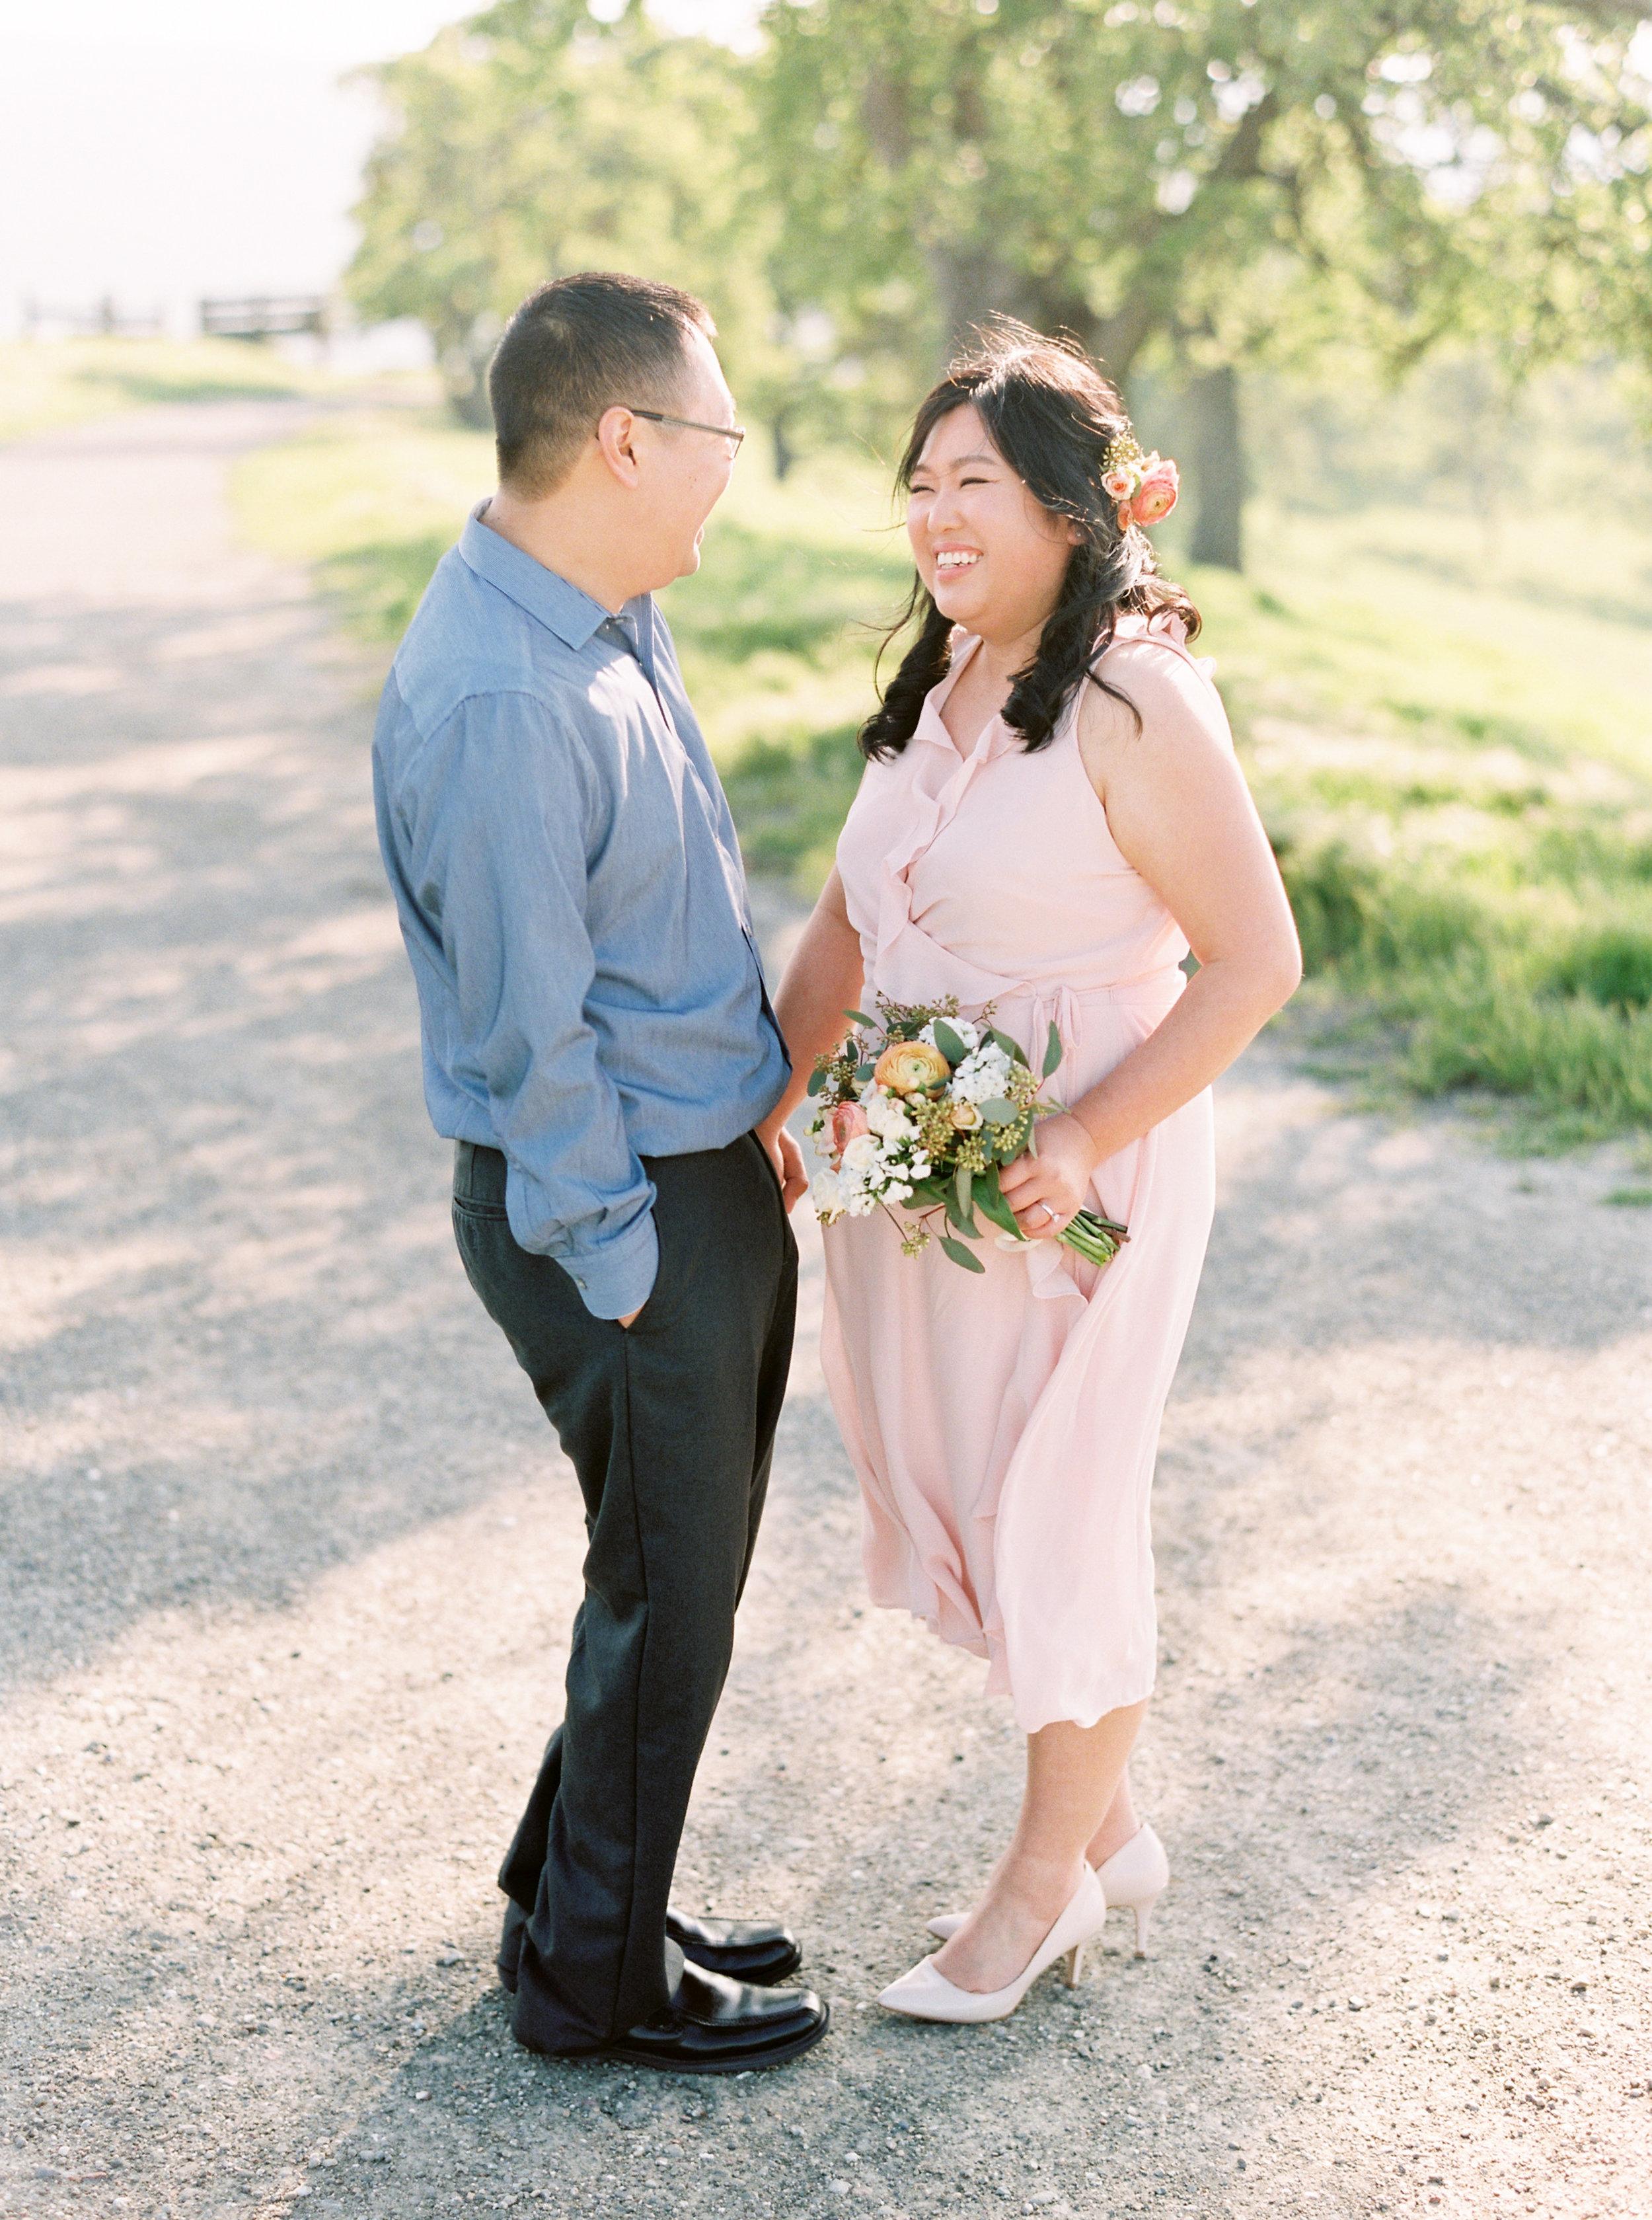 del-valle-livermore-bay-area-wedding-photographer-73.jpg